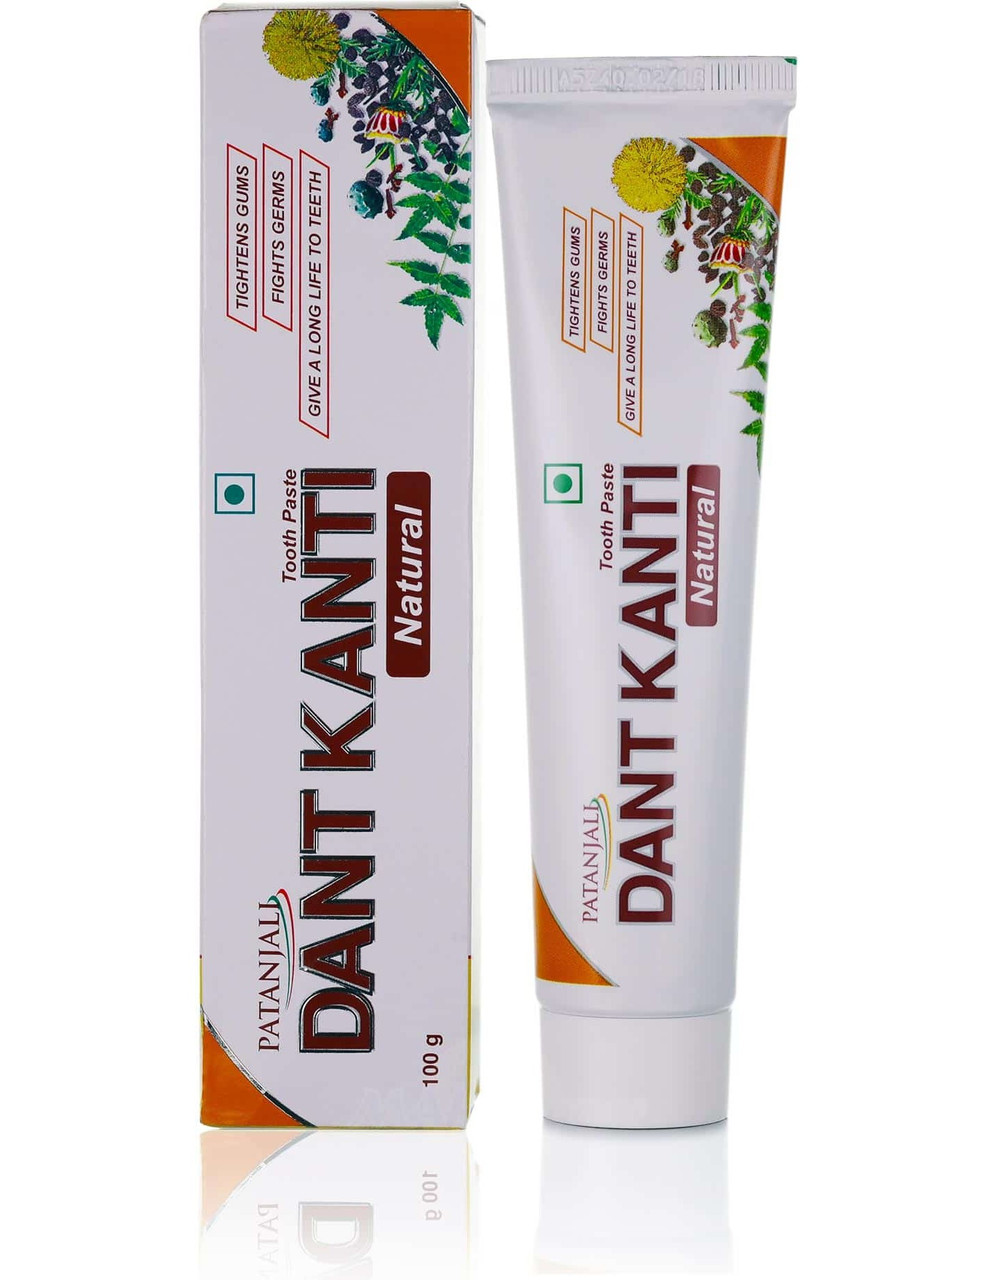 Зубная паста Dant Kanti Natural, Дант Канти Натурал, 100 гр Patanjali